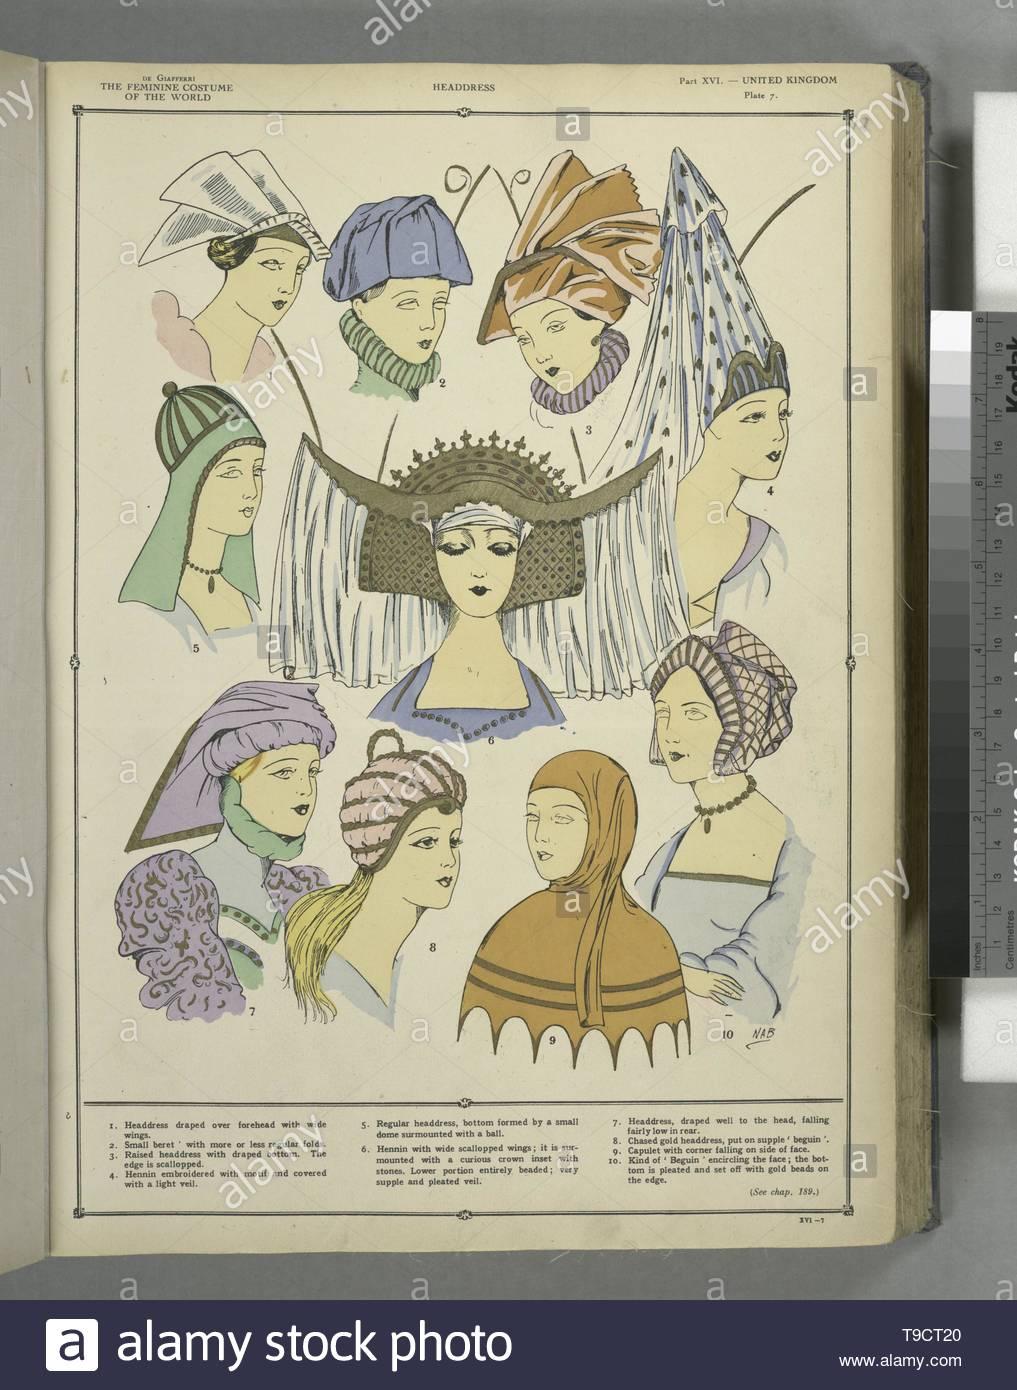 Giafferri,PaulLouisde,b 1886-Headdress - Stock Image